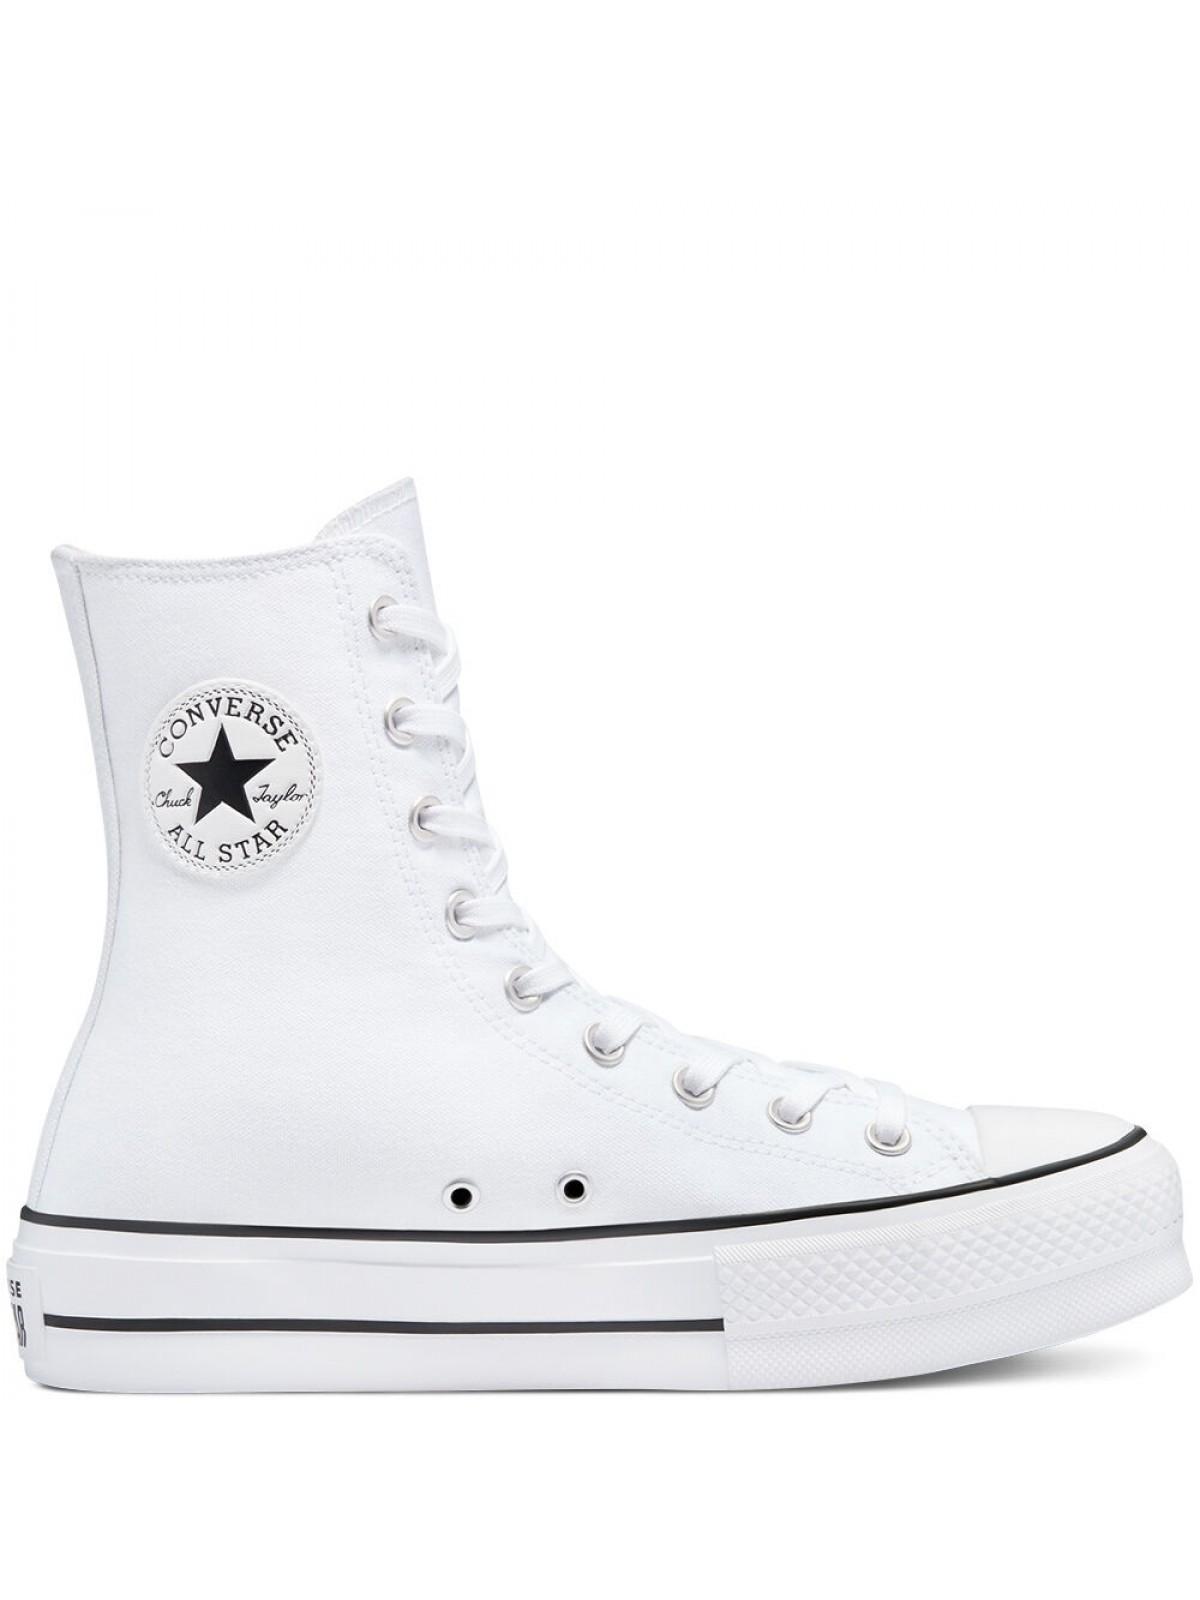 Converse Chuck Taylor all star Lift XI plateforme blanc